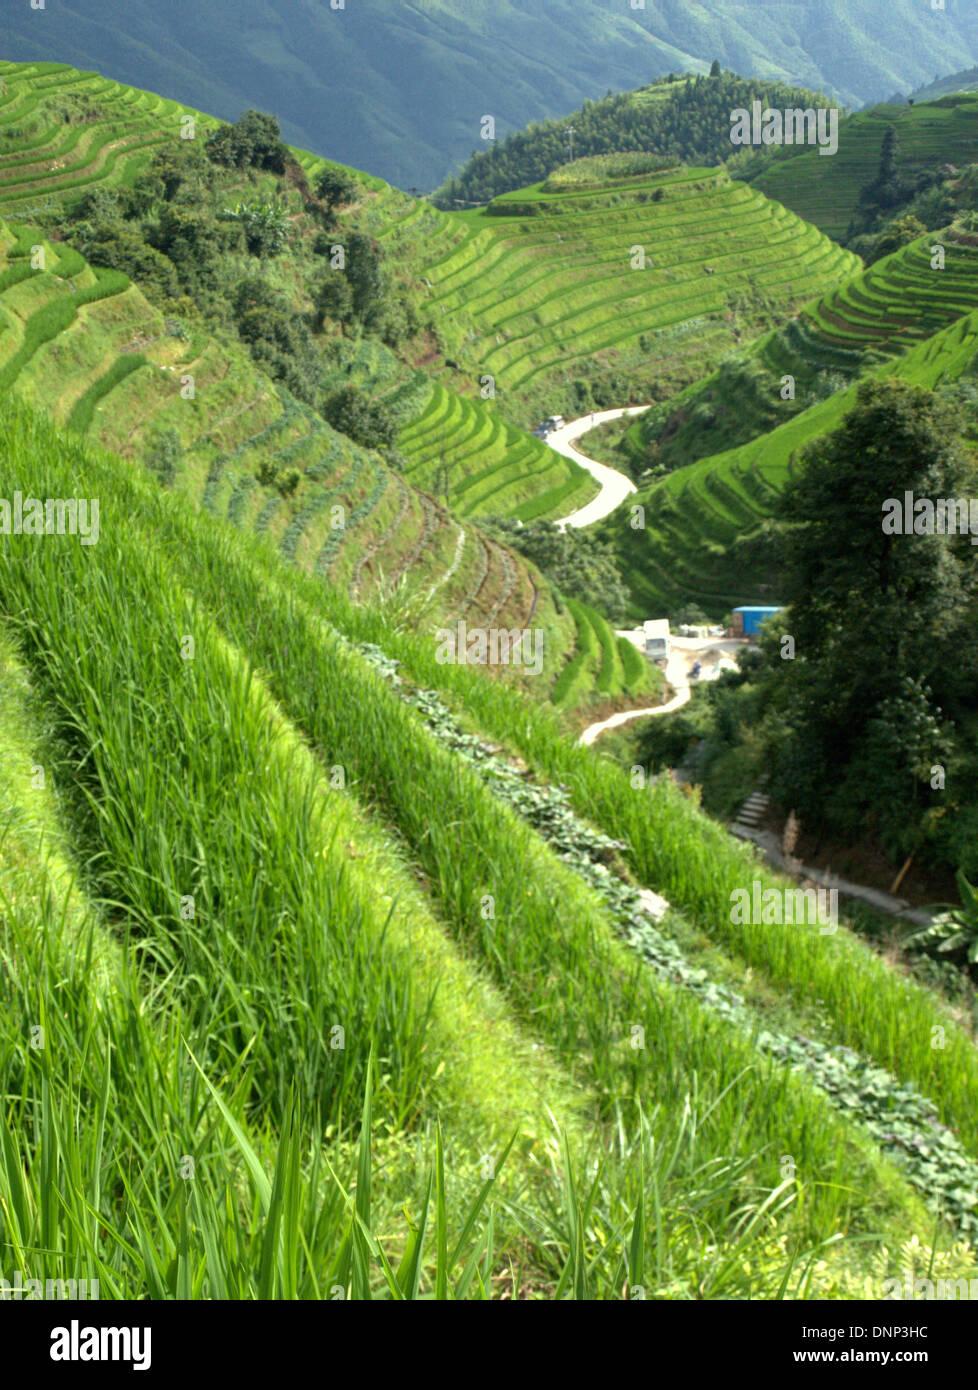 The Longsheng Rice Terraces (Lóngshèng Tītián) or Dragon's Backbone Rice Terraces, located in Longsheng County, Stock Photo